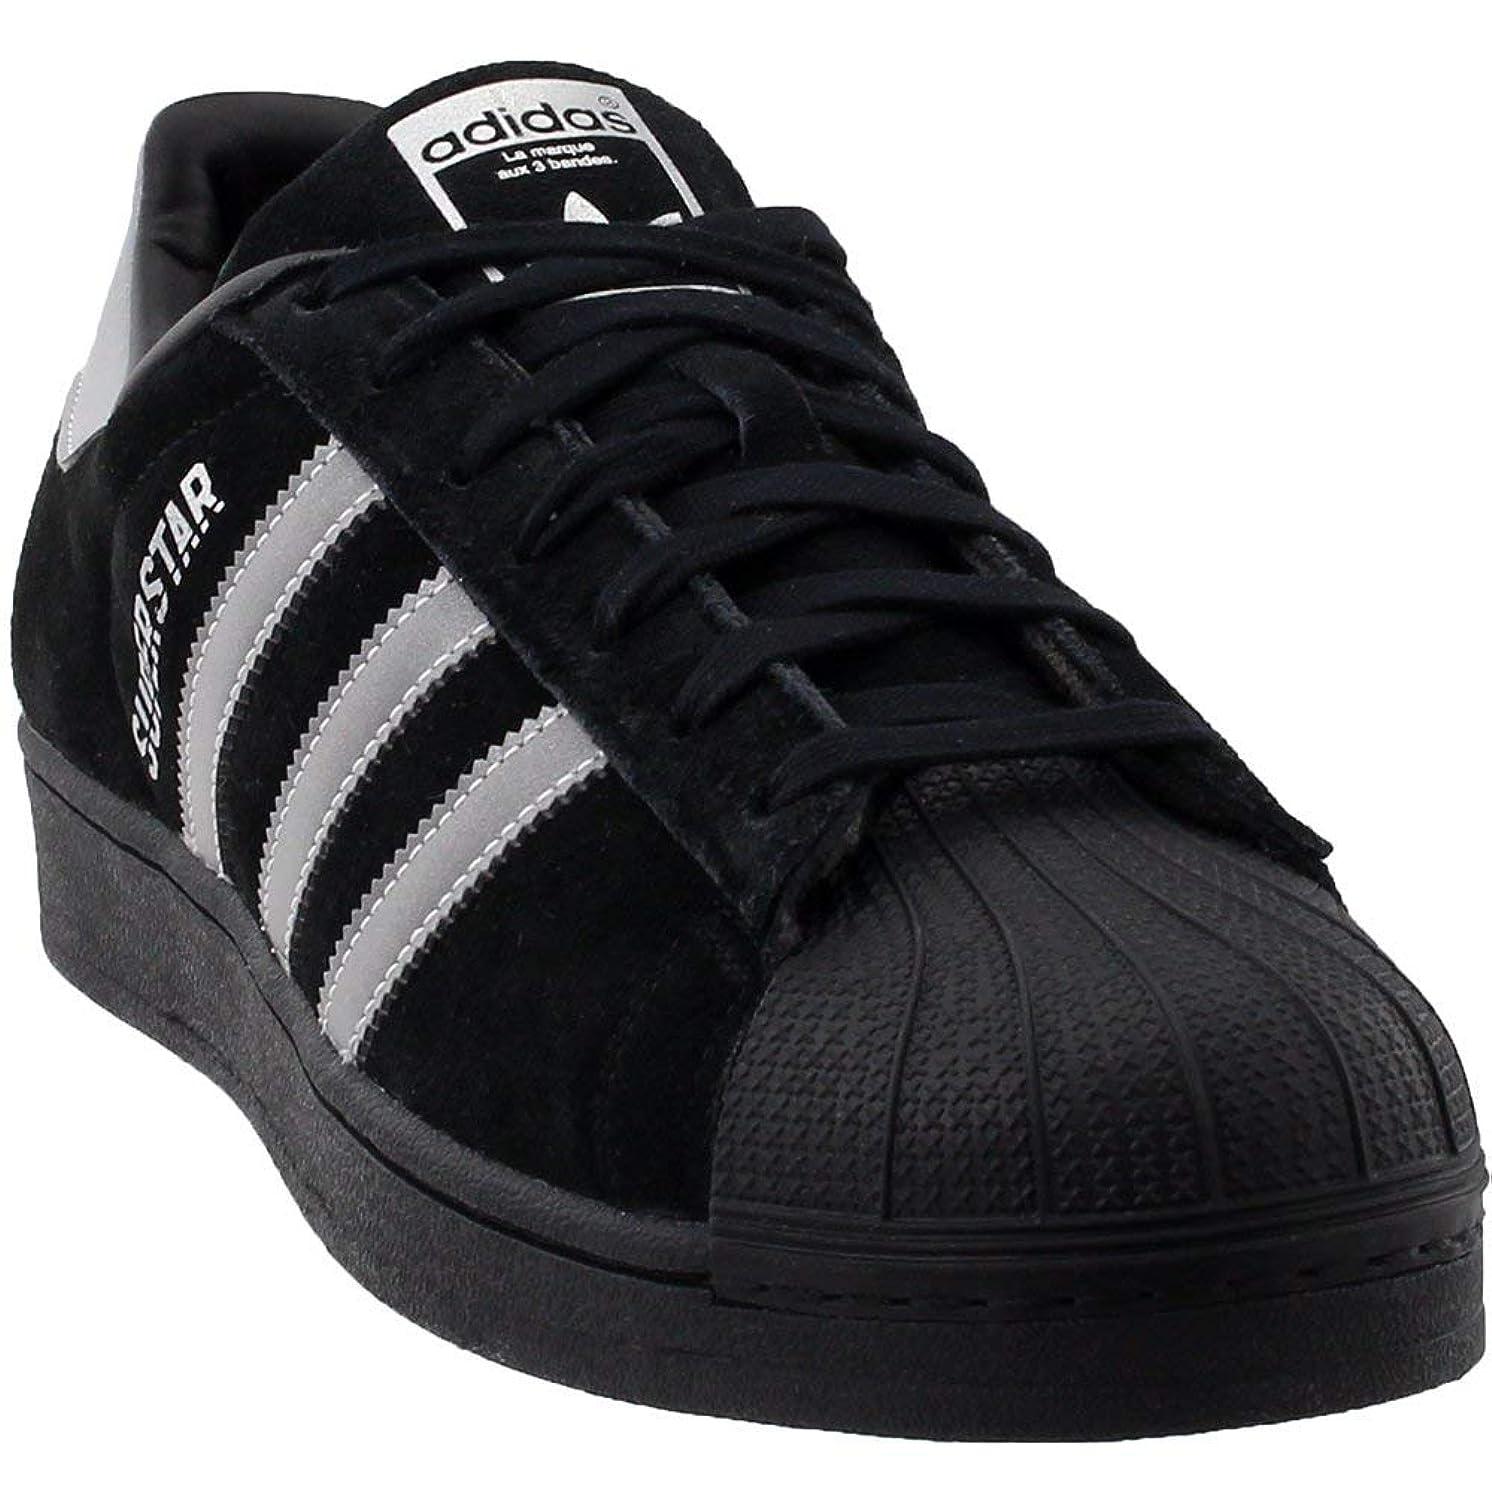 adidas Originals Men's Superstar Sneaker Running Shoe Core Black/Black/Core Black 10.5 D(M) US